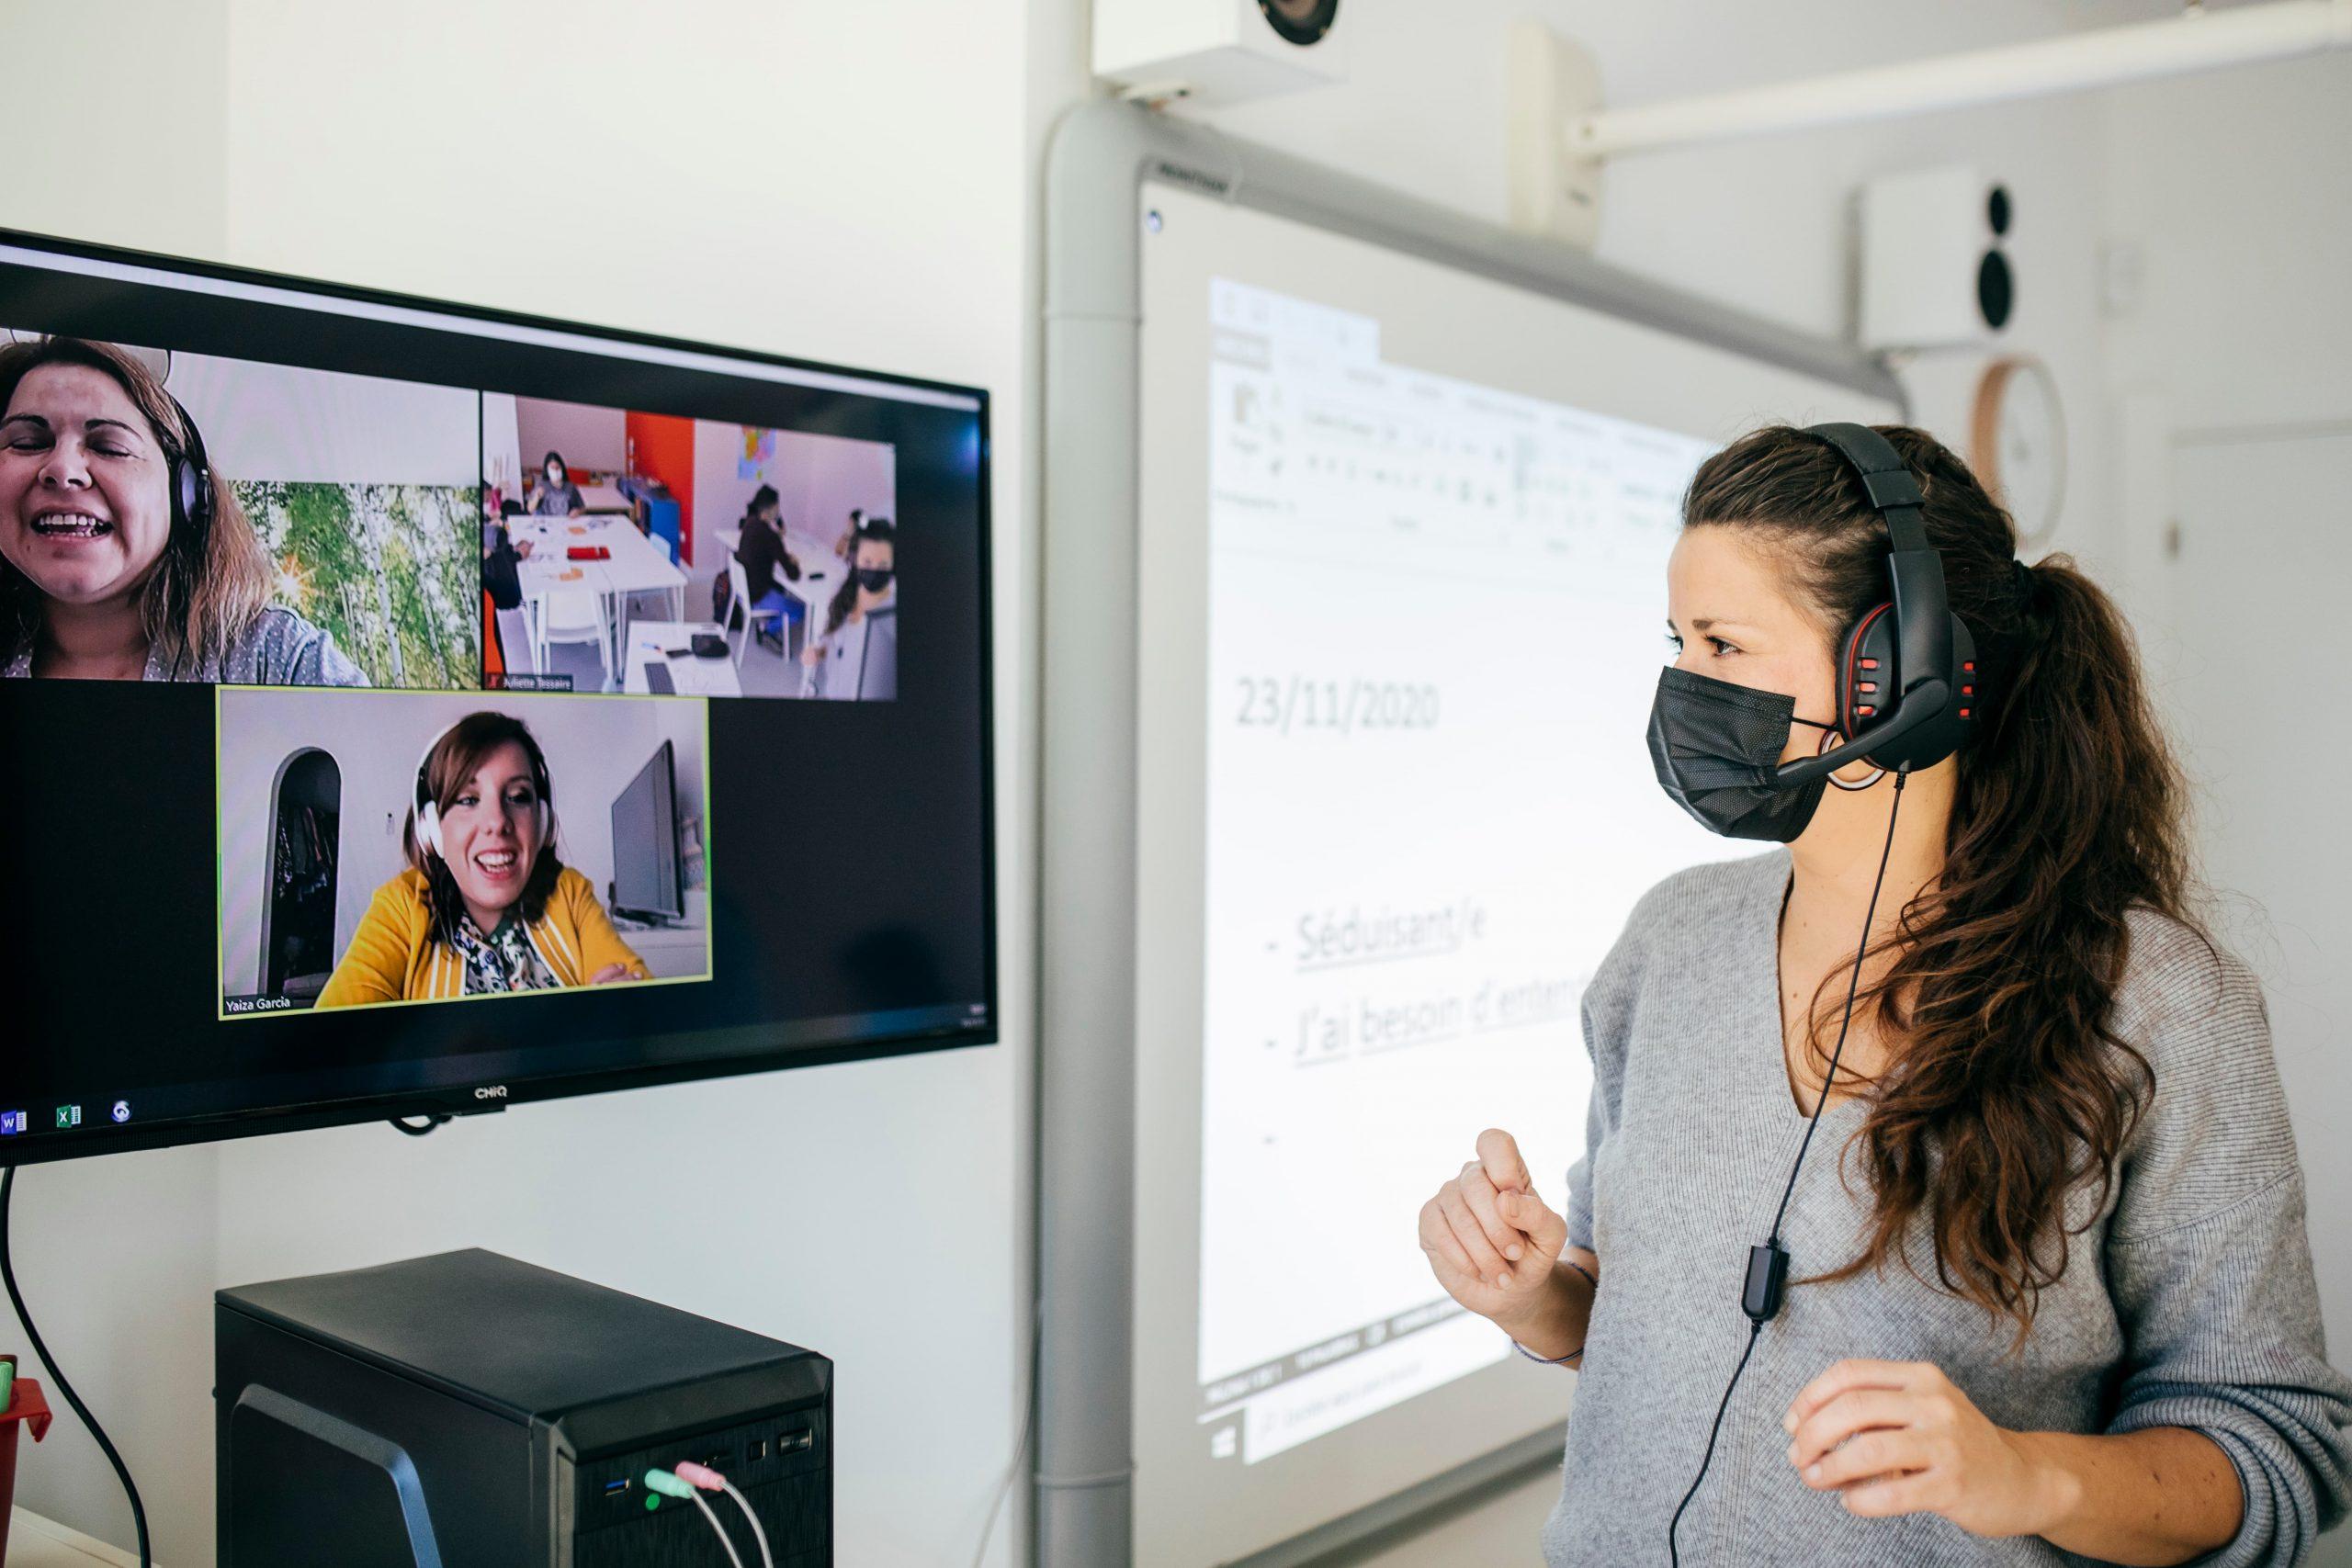 Juliette Tessaire, nuestra coordinadora pedagógica, imparte una clase de francés online